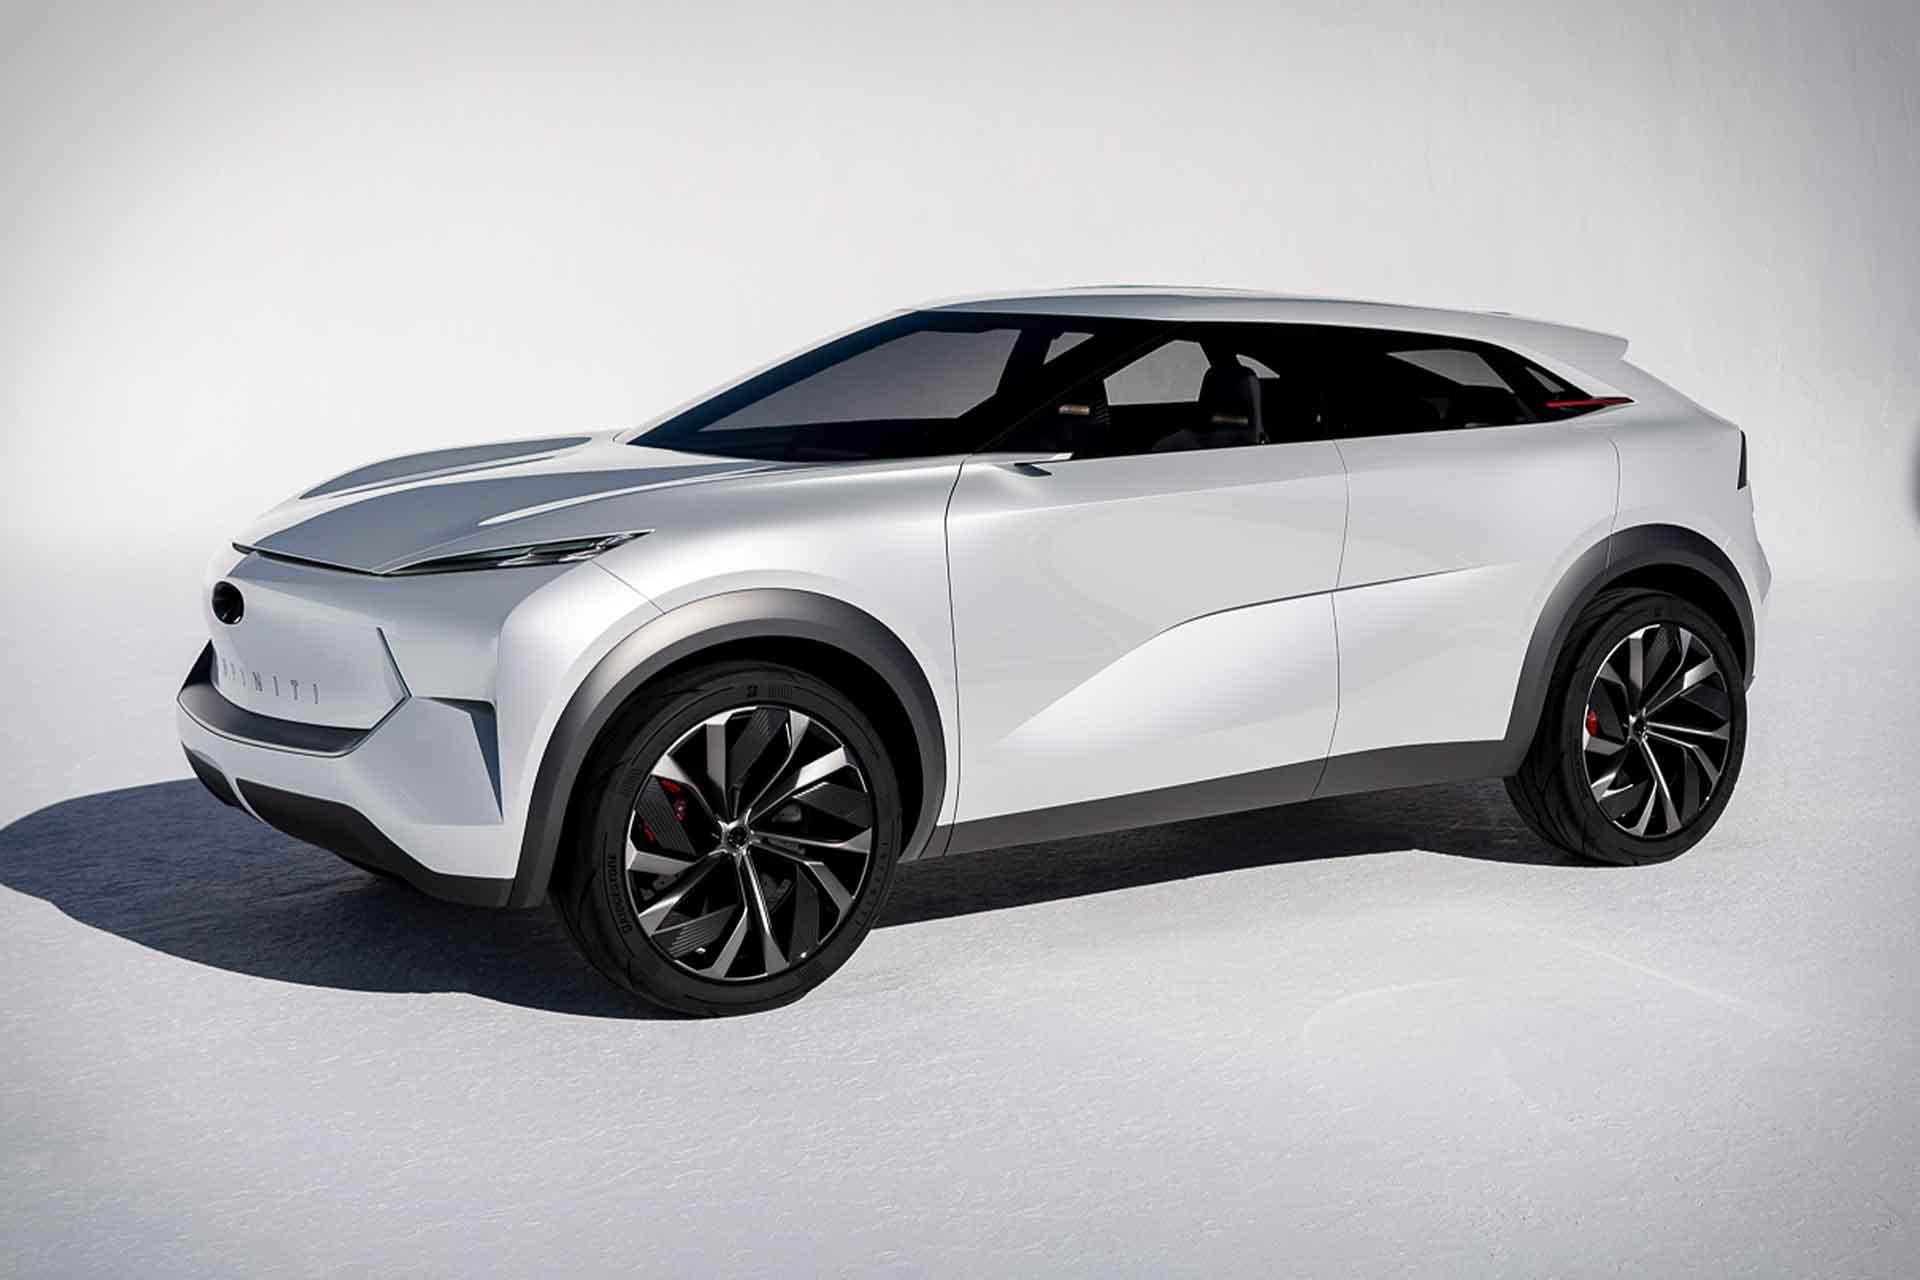 Infiniti QX Inspiration Concept SUV